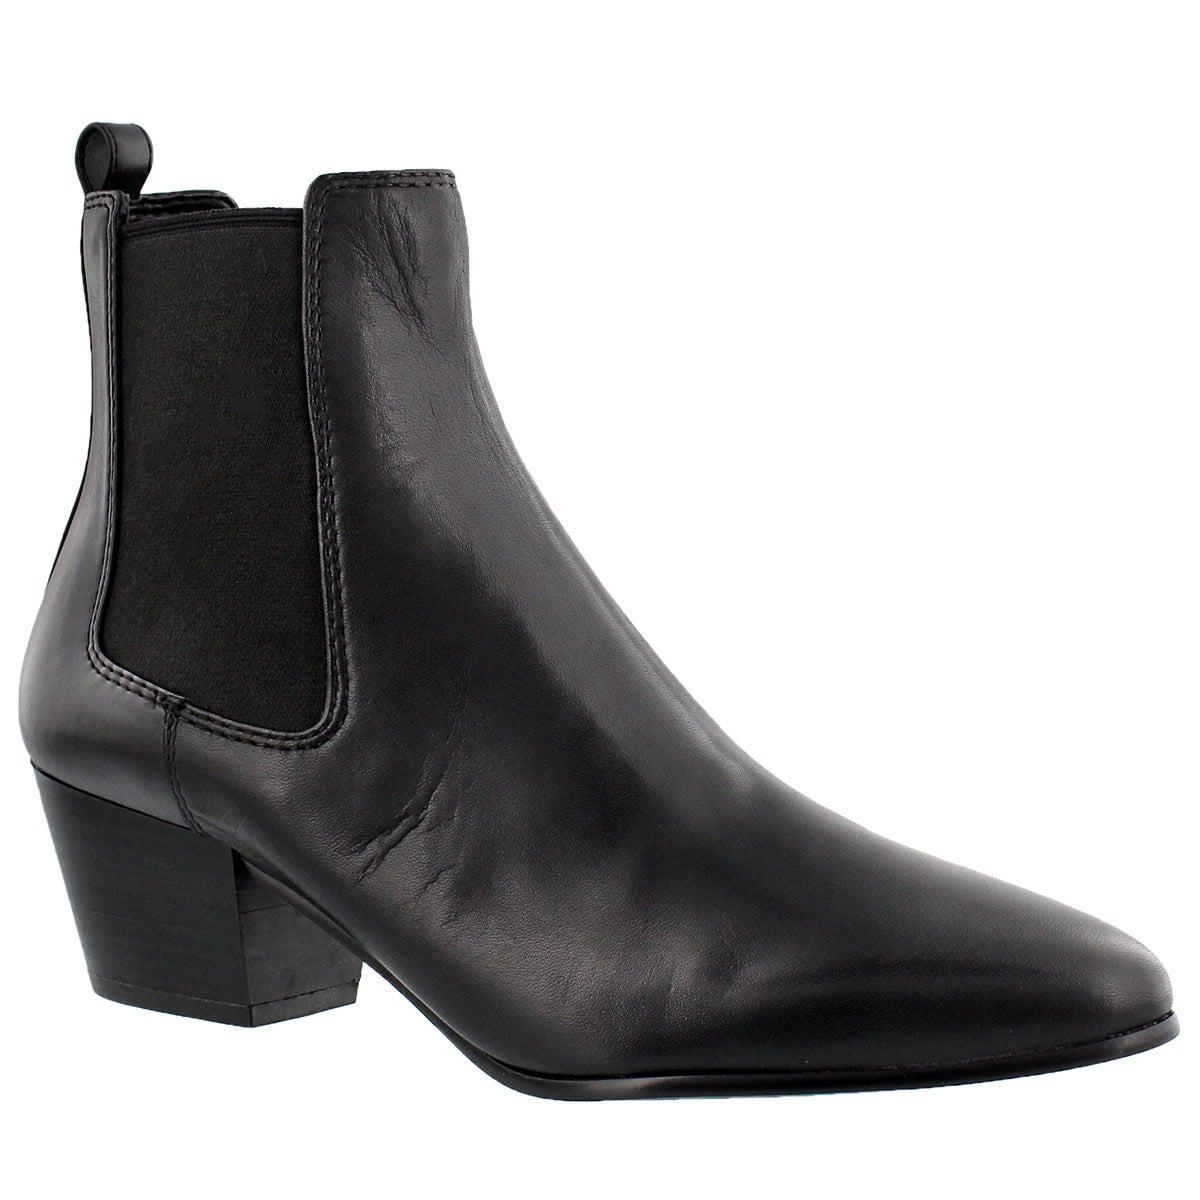 Lds Reesa black leather slip on bootie